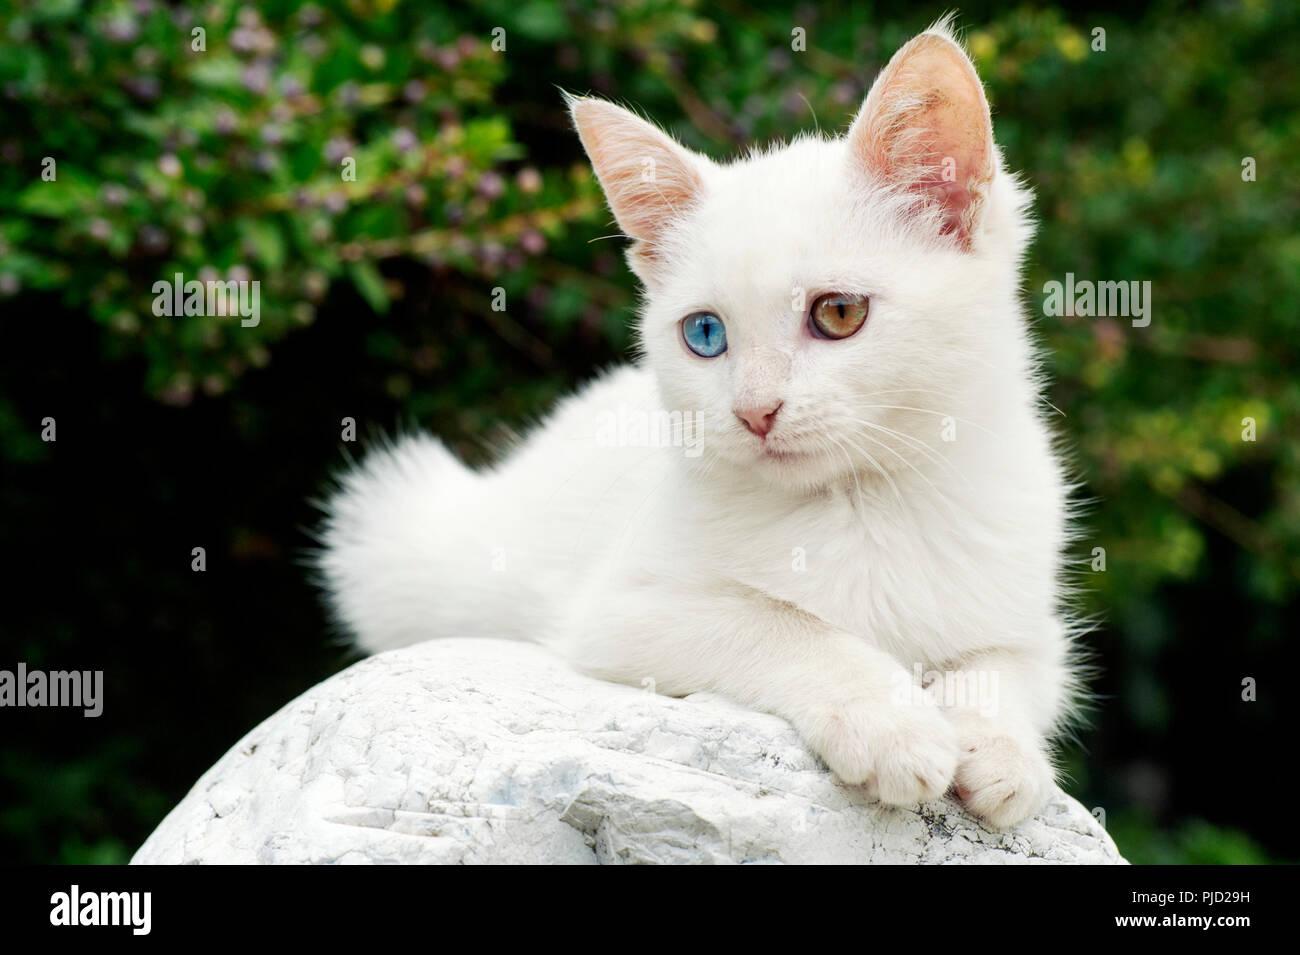 26209970f0 A beautiful white odd eyed kitten lying on a stone outdoors Stock ...